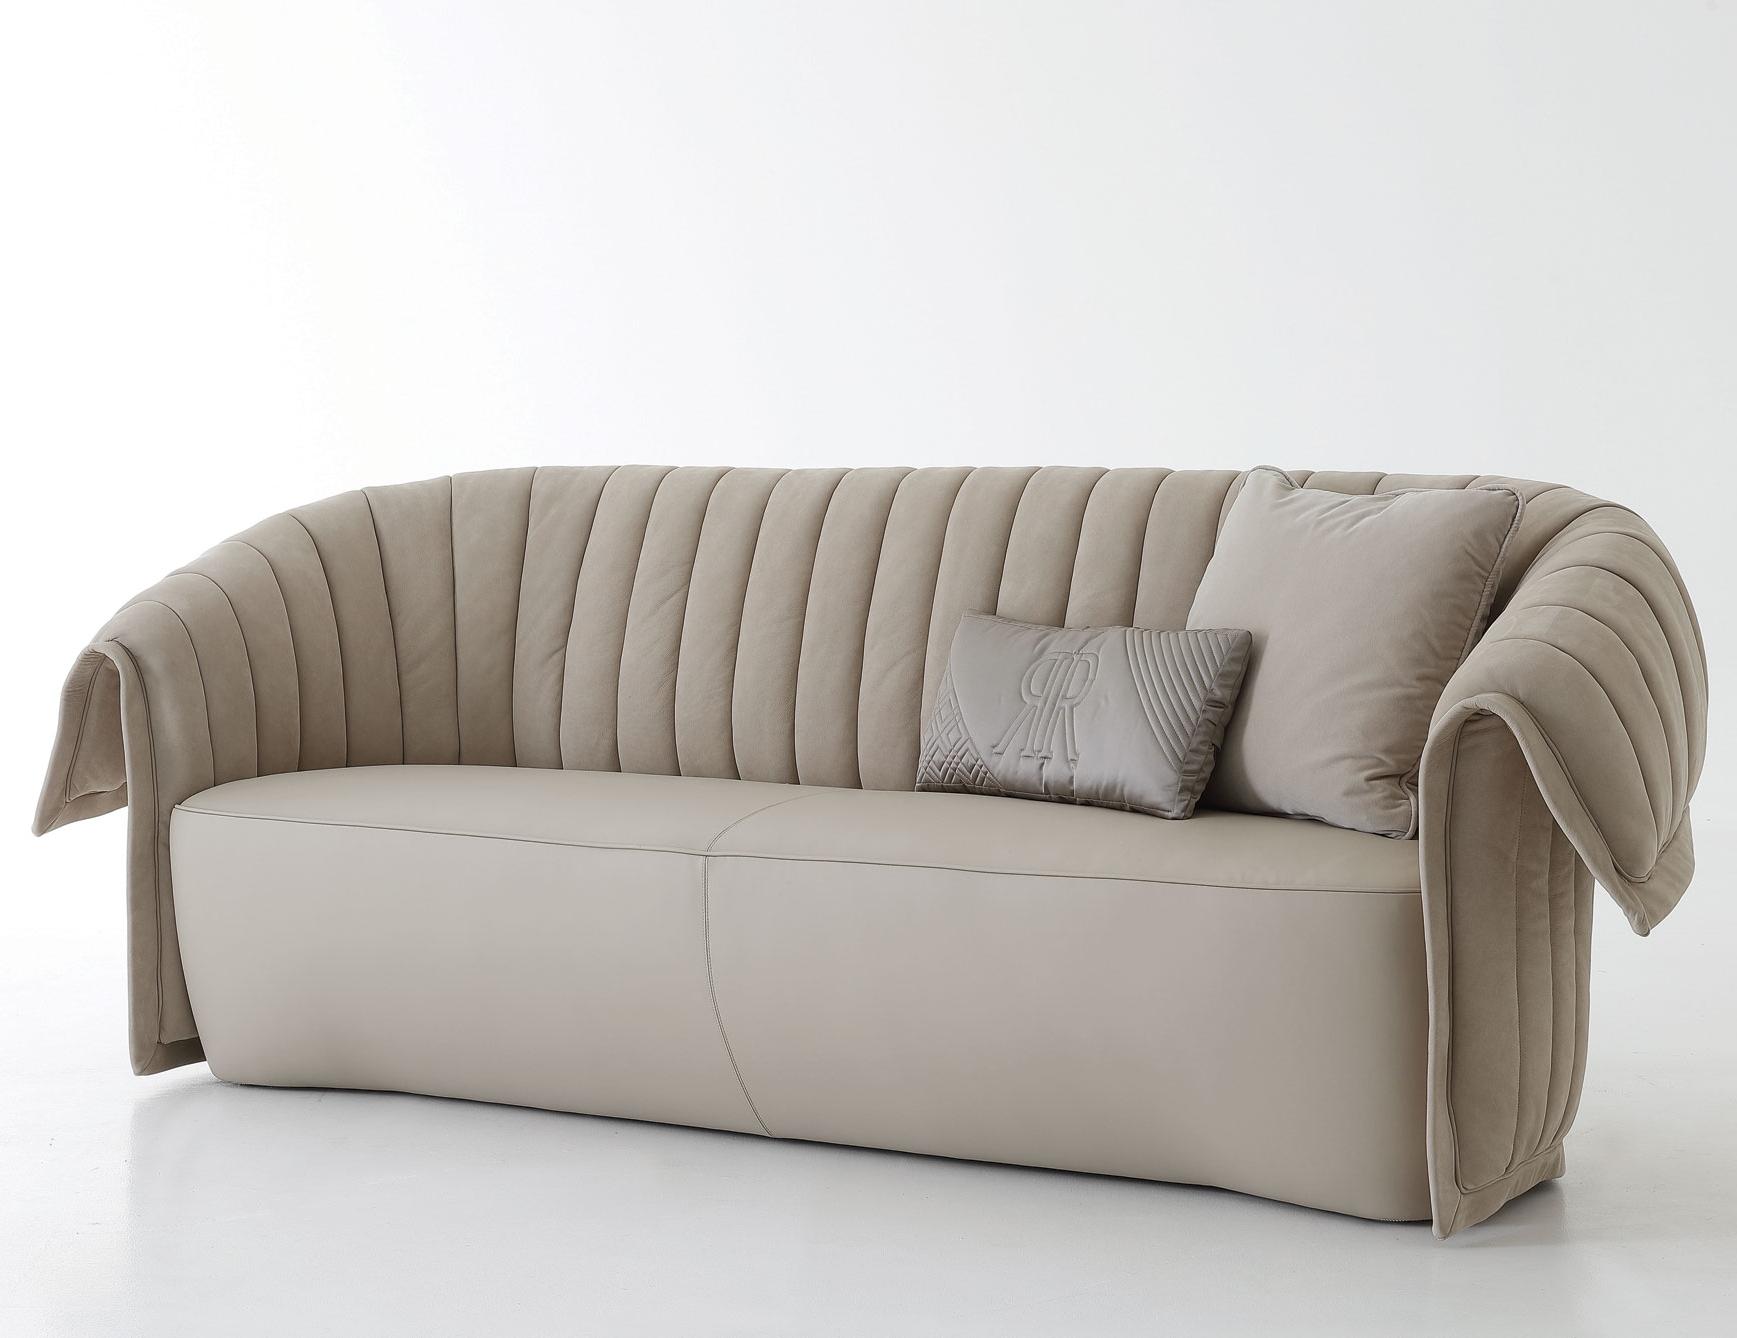 Manta sofa Drdp Nella Vetrina Rugiano Manta In Beige Suede Leather sofa